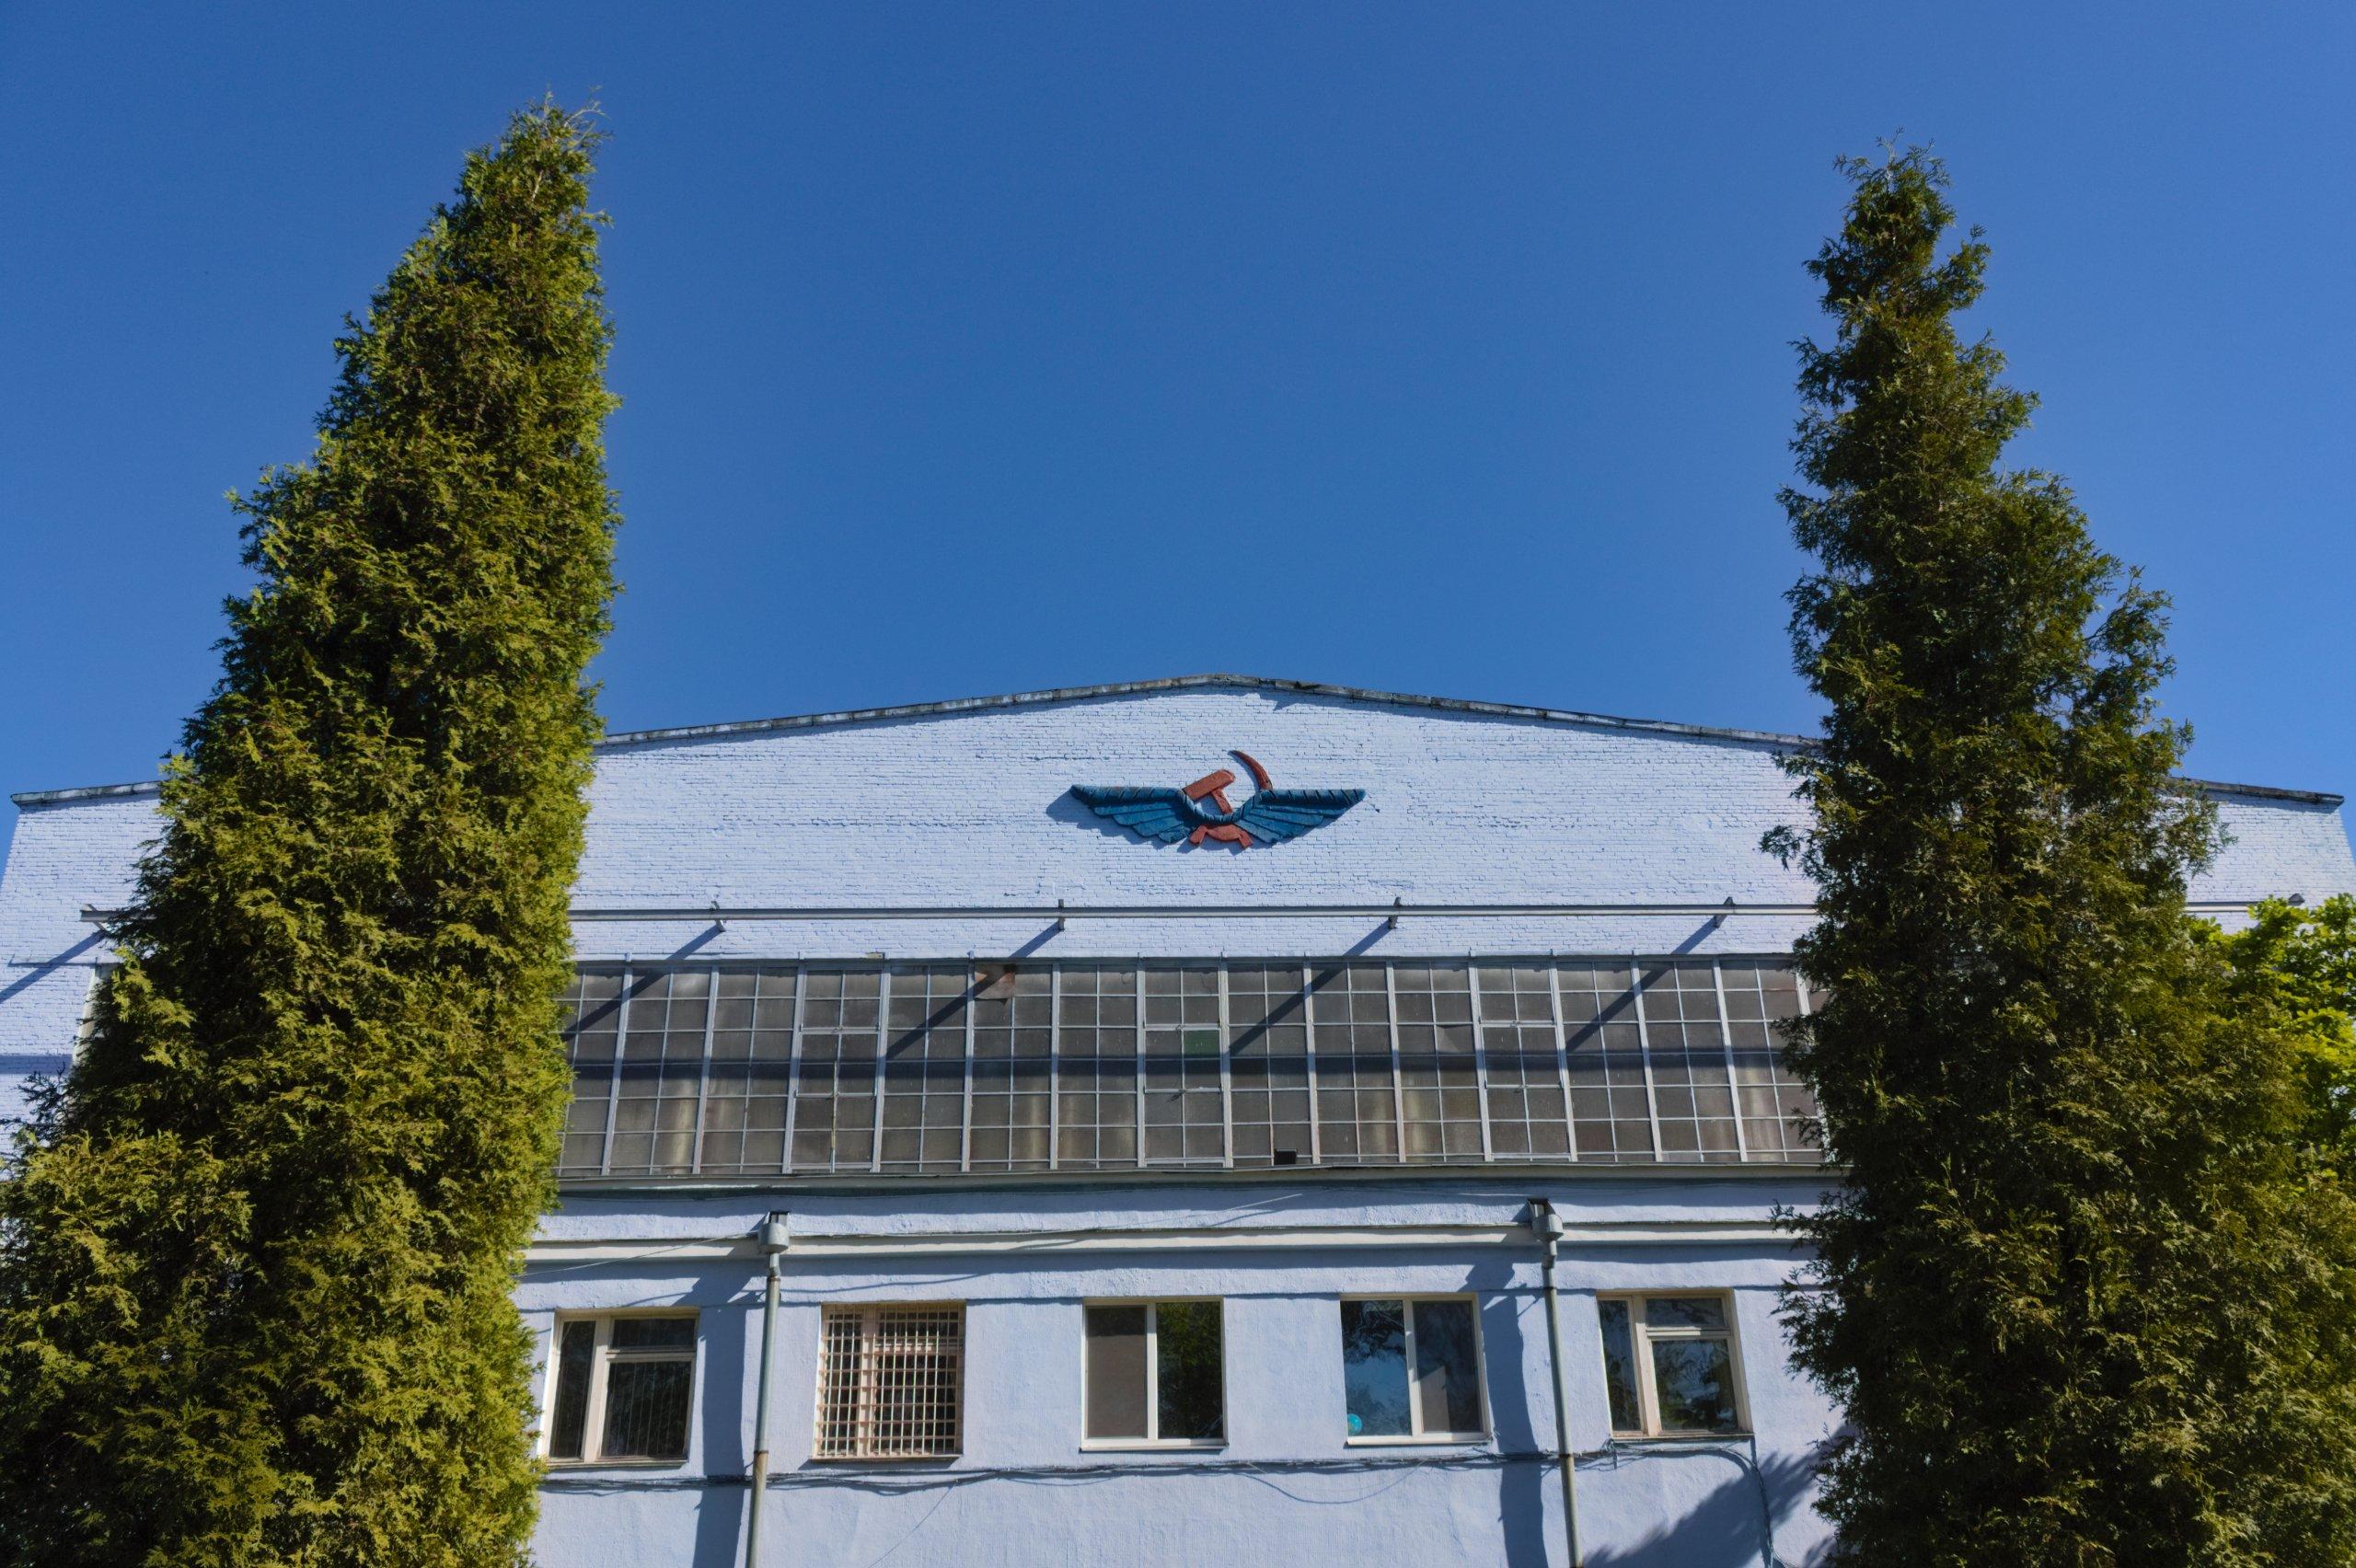 Артефакт СССР на здании авиаремонтного завода